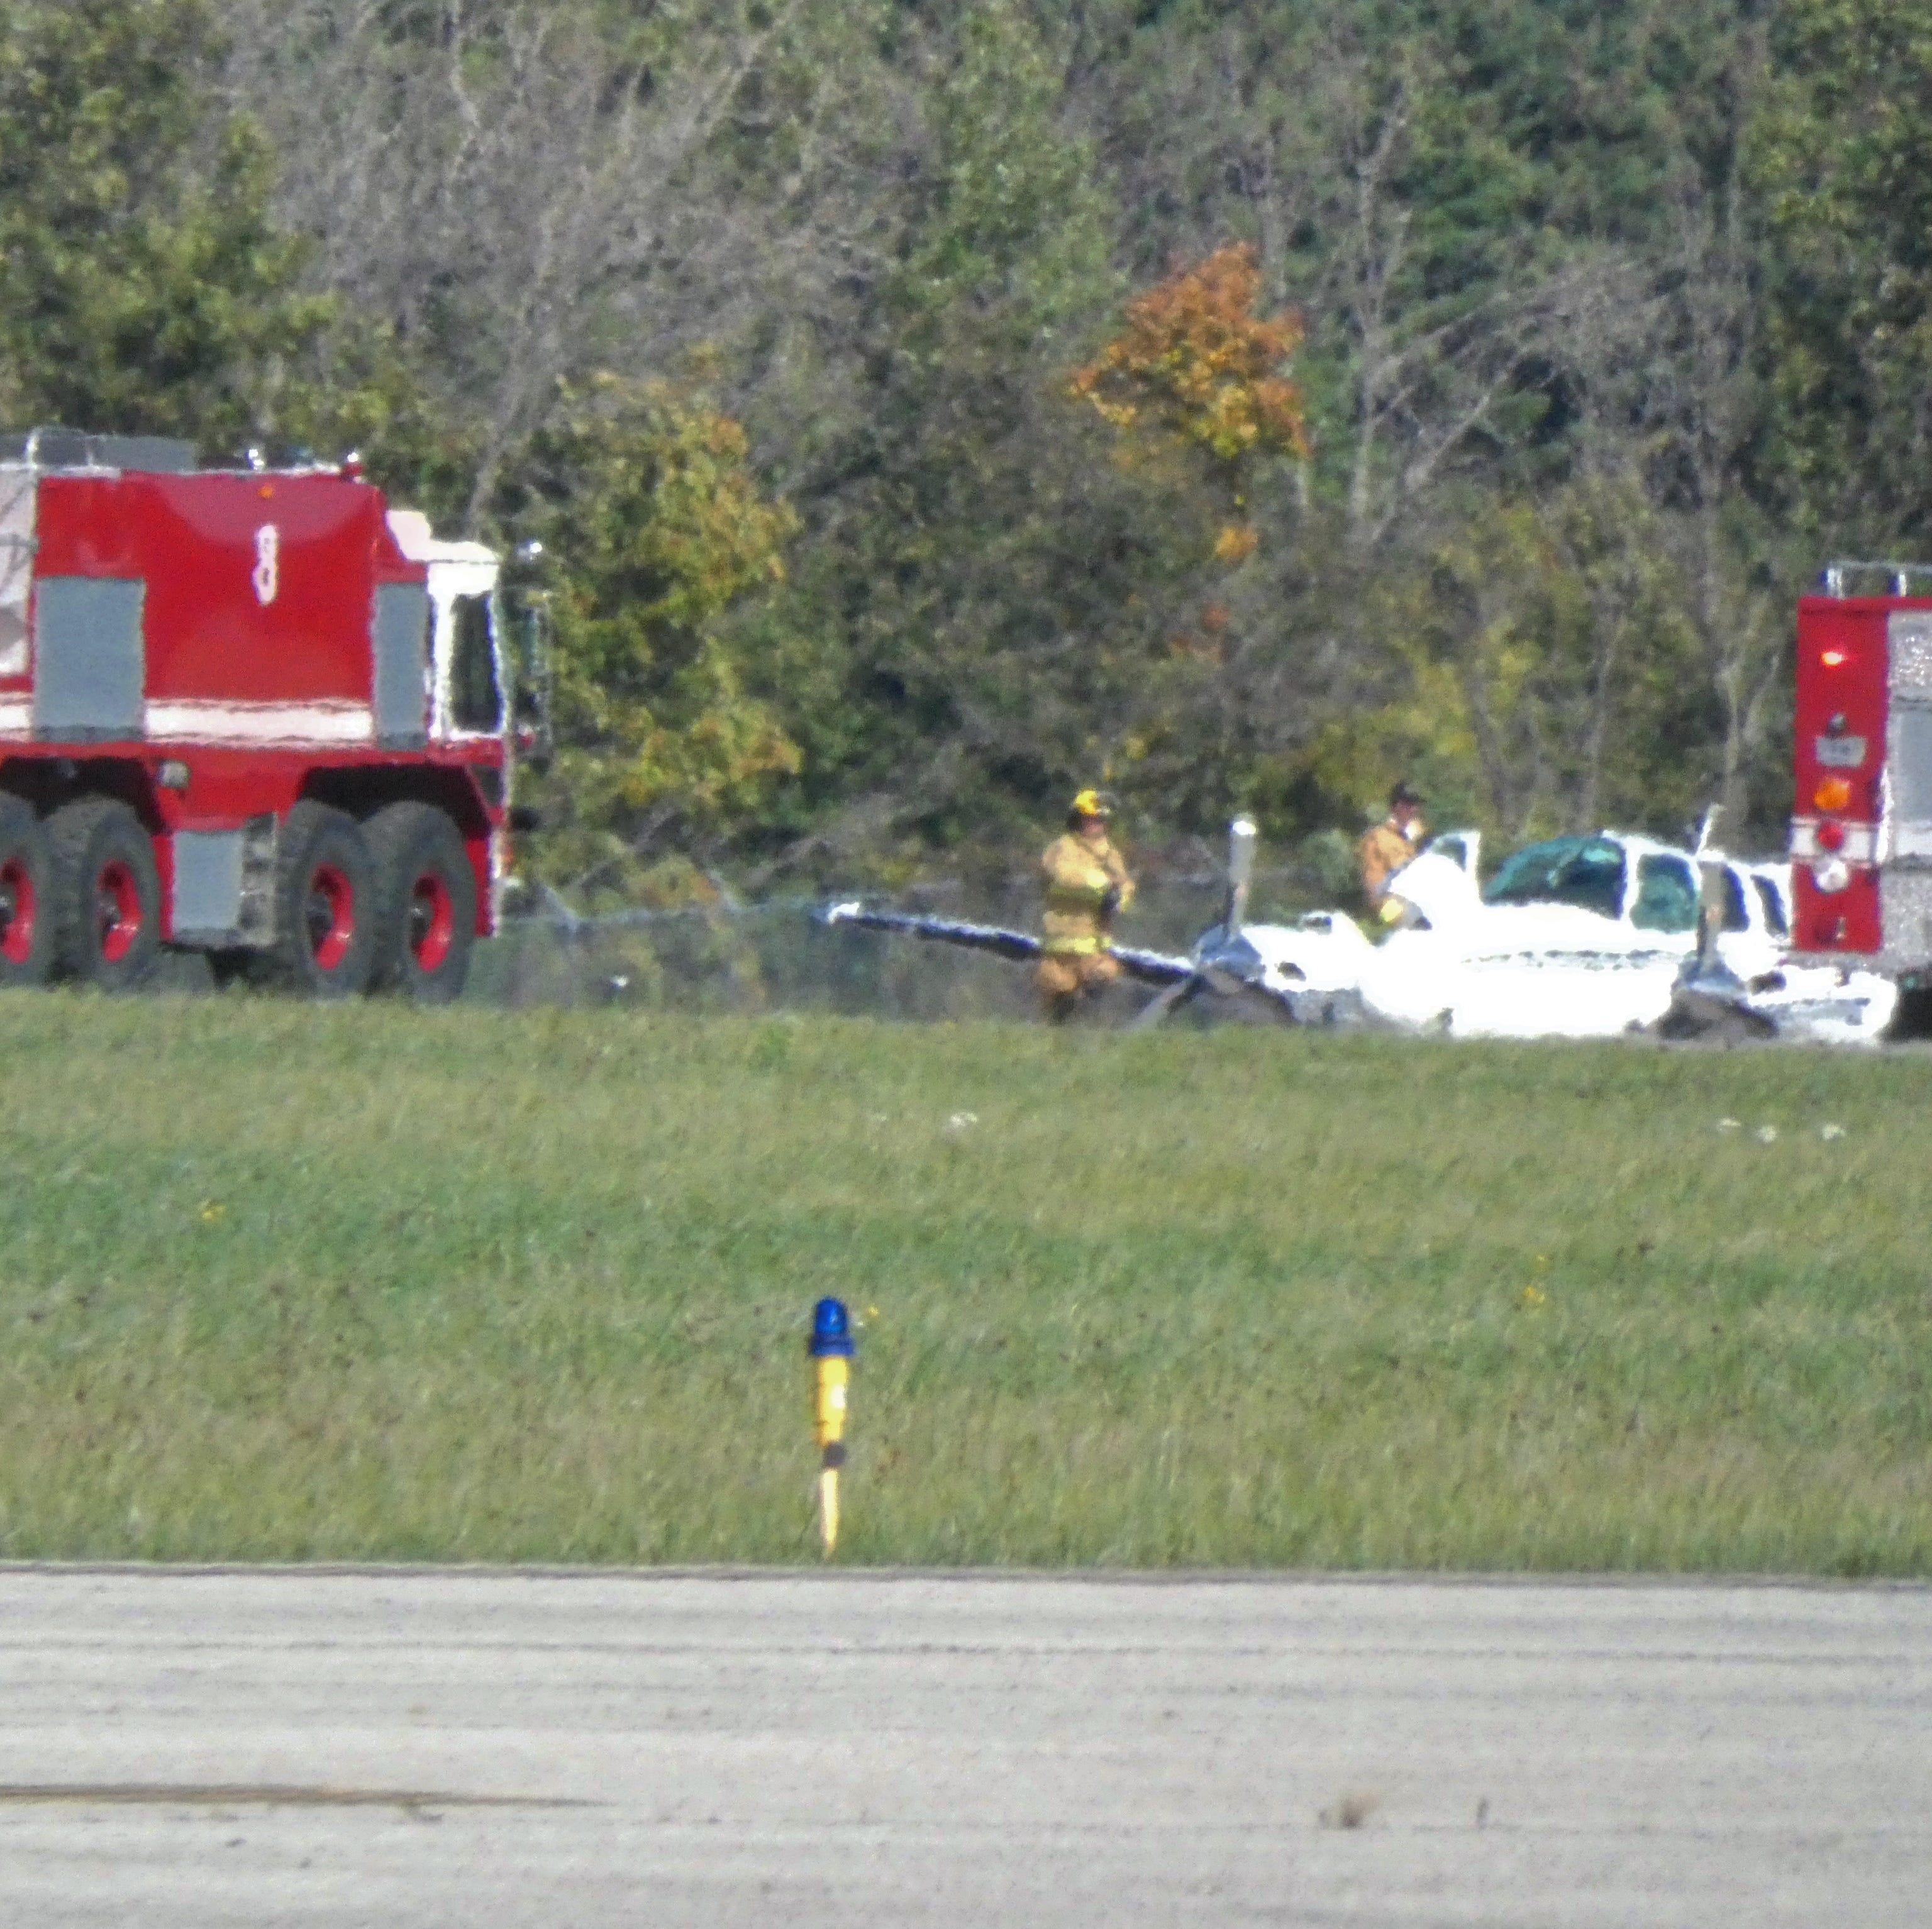 Emergency landing at Lahm Airport; no injuries